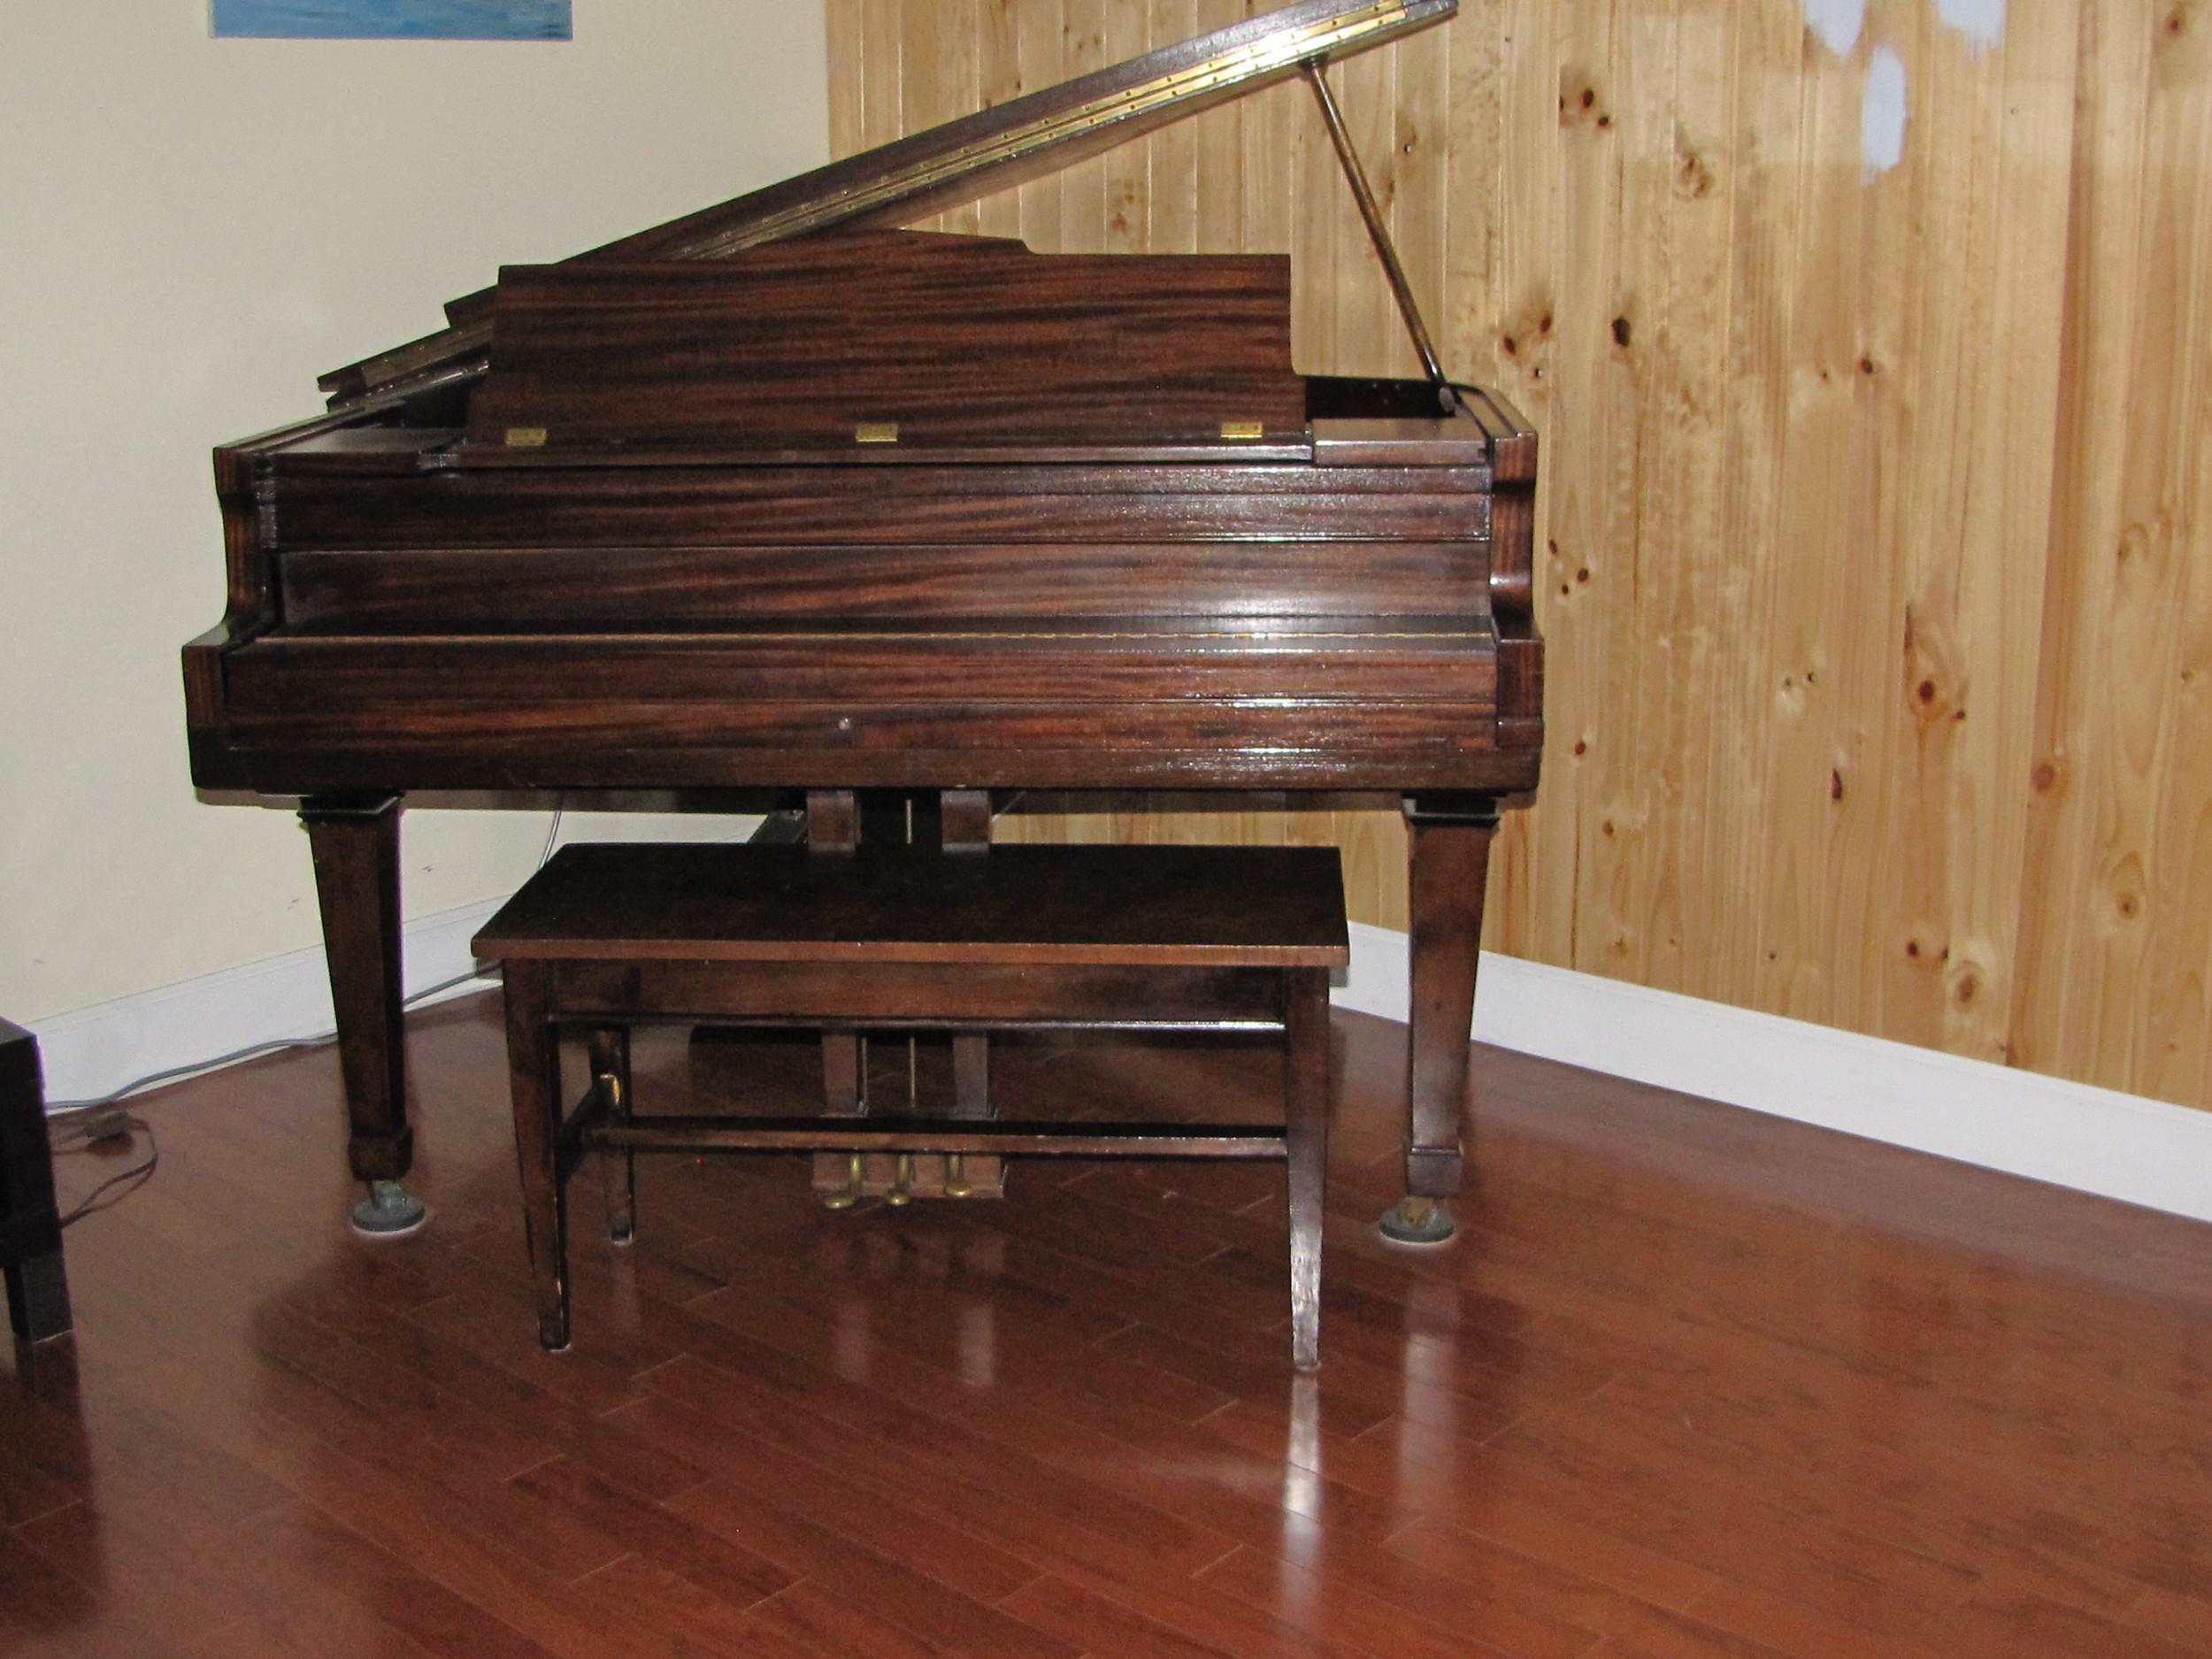 piano moving aug 2013 003.JPG